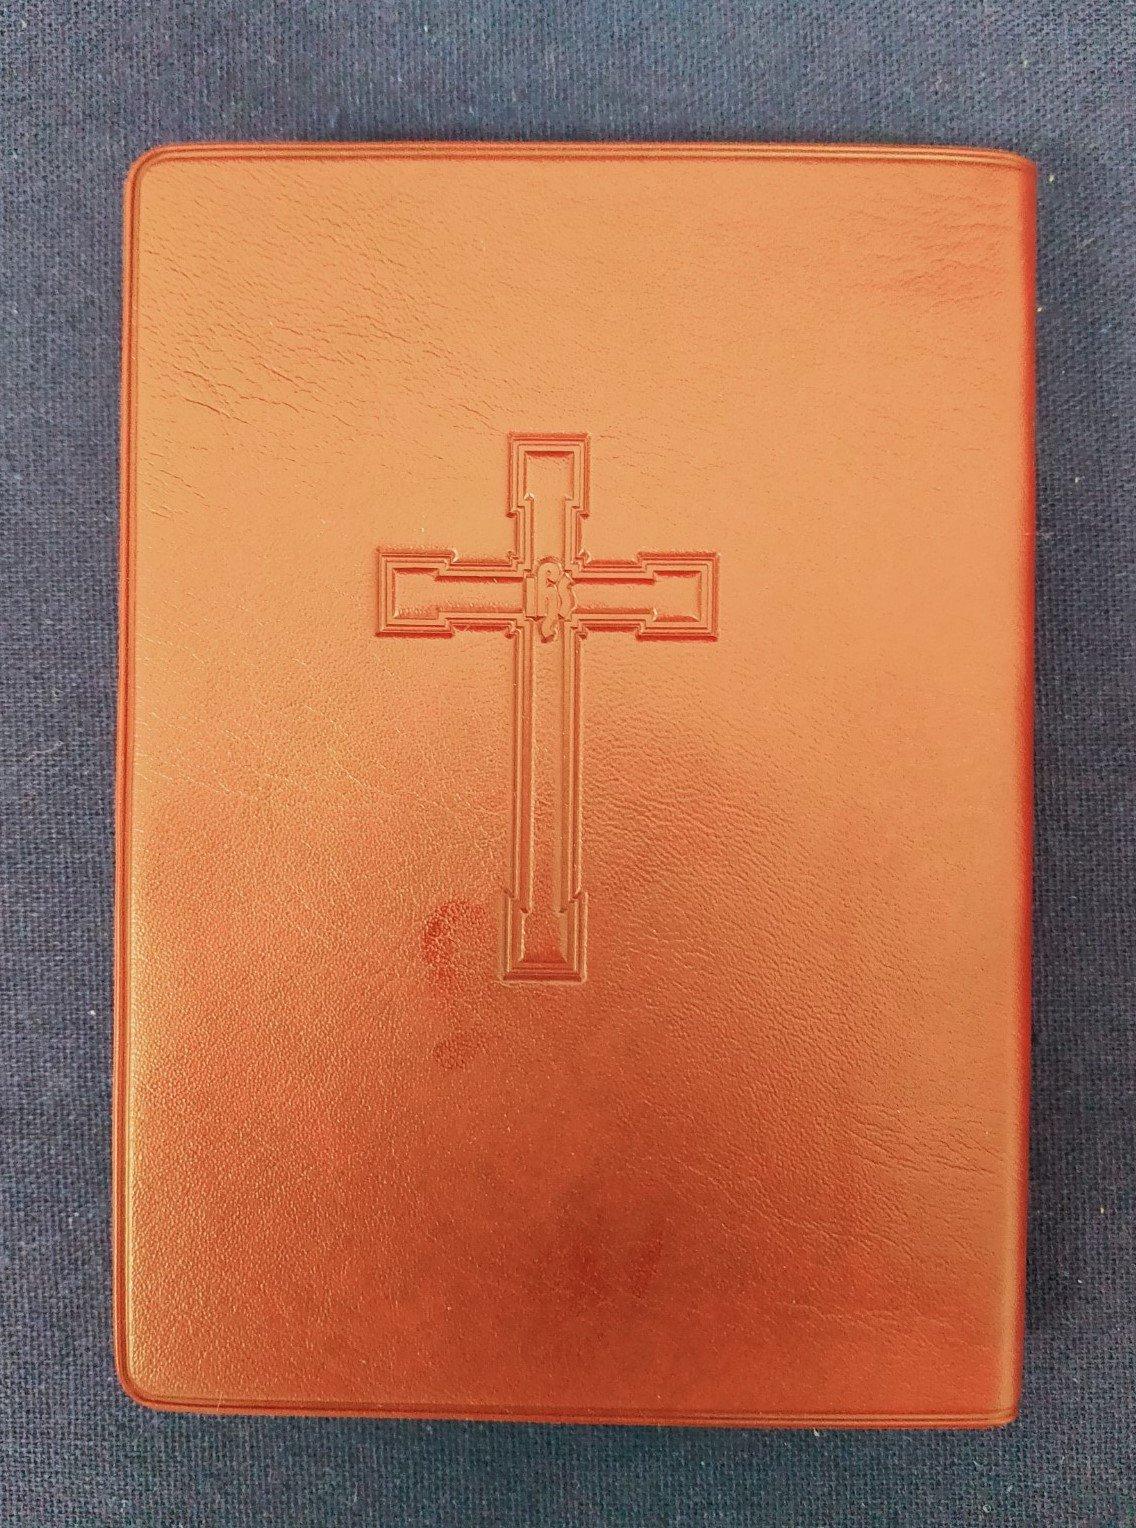 日本聖公会 古今聖歌集 赤の商品画像